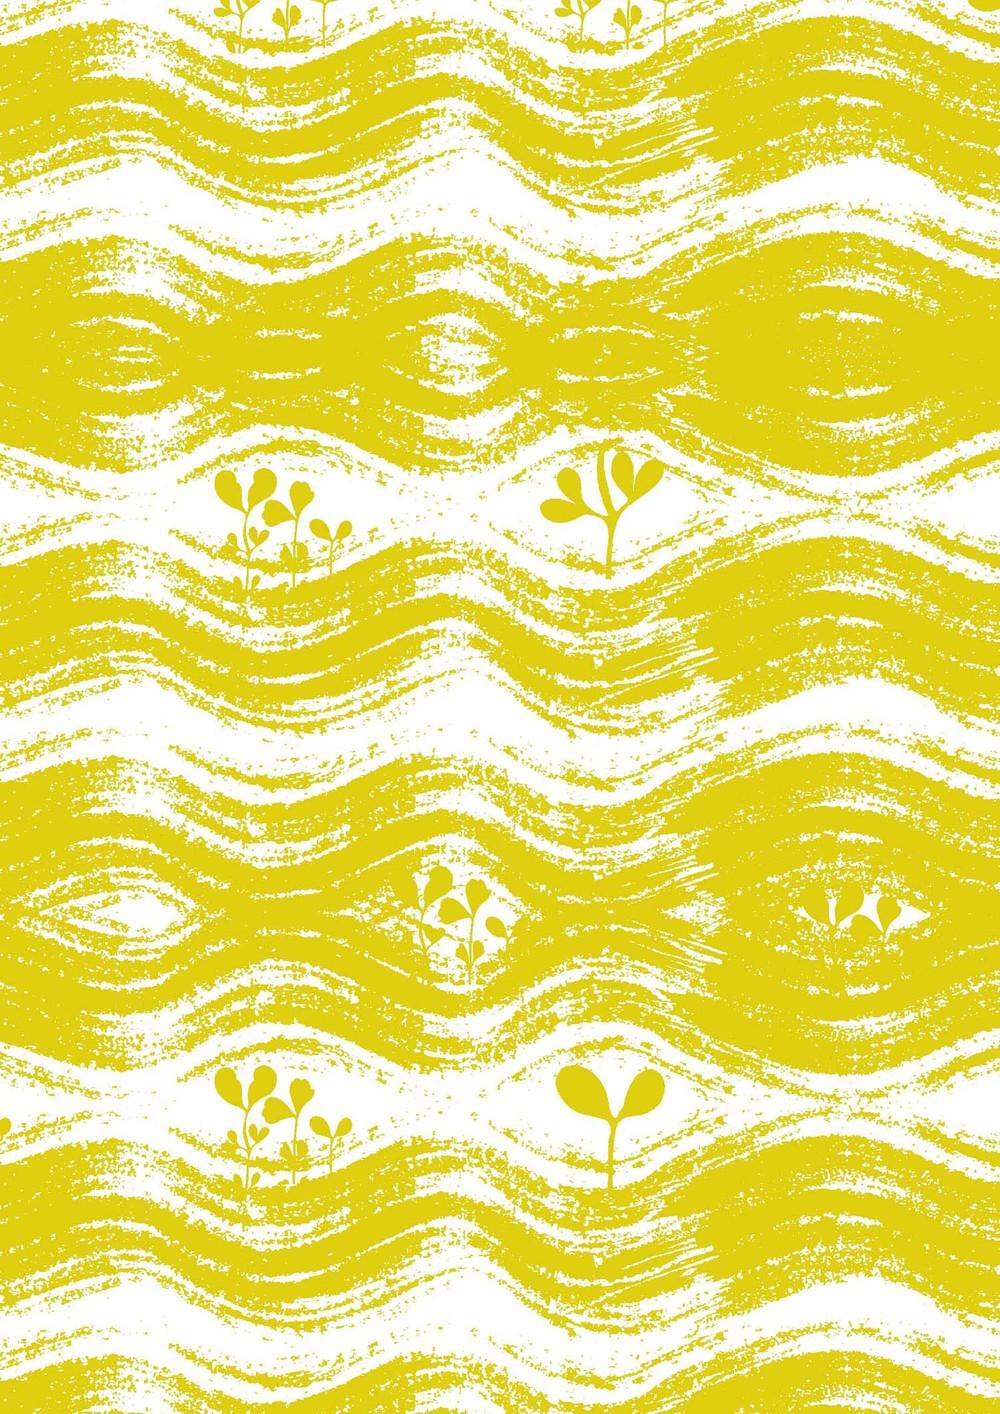 Yellow garden screen print